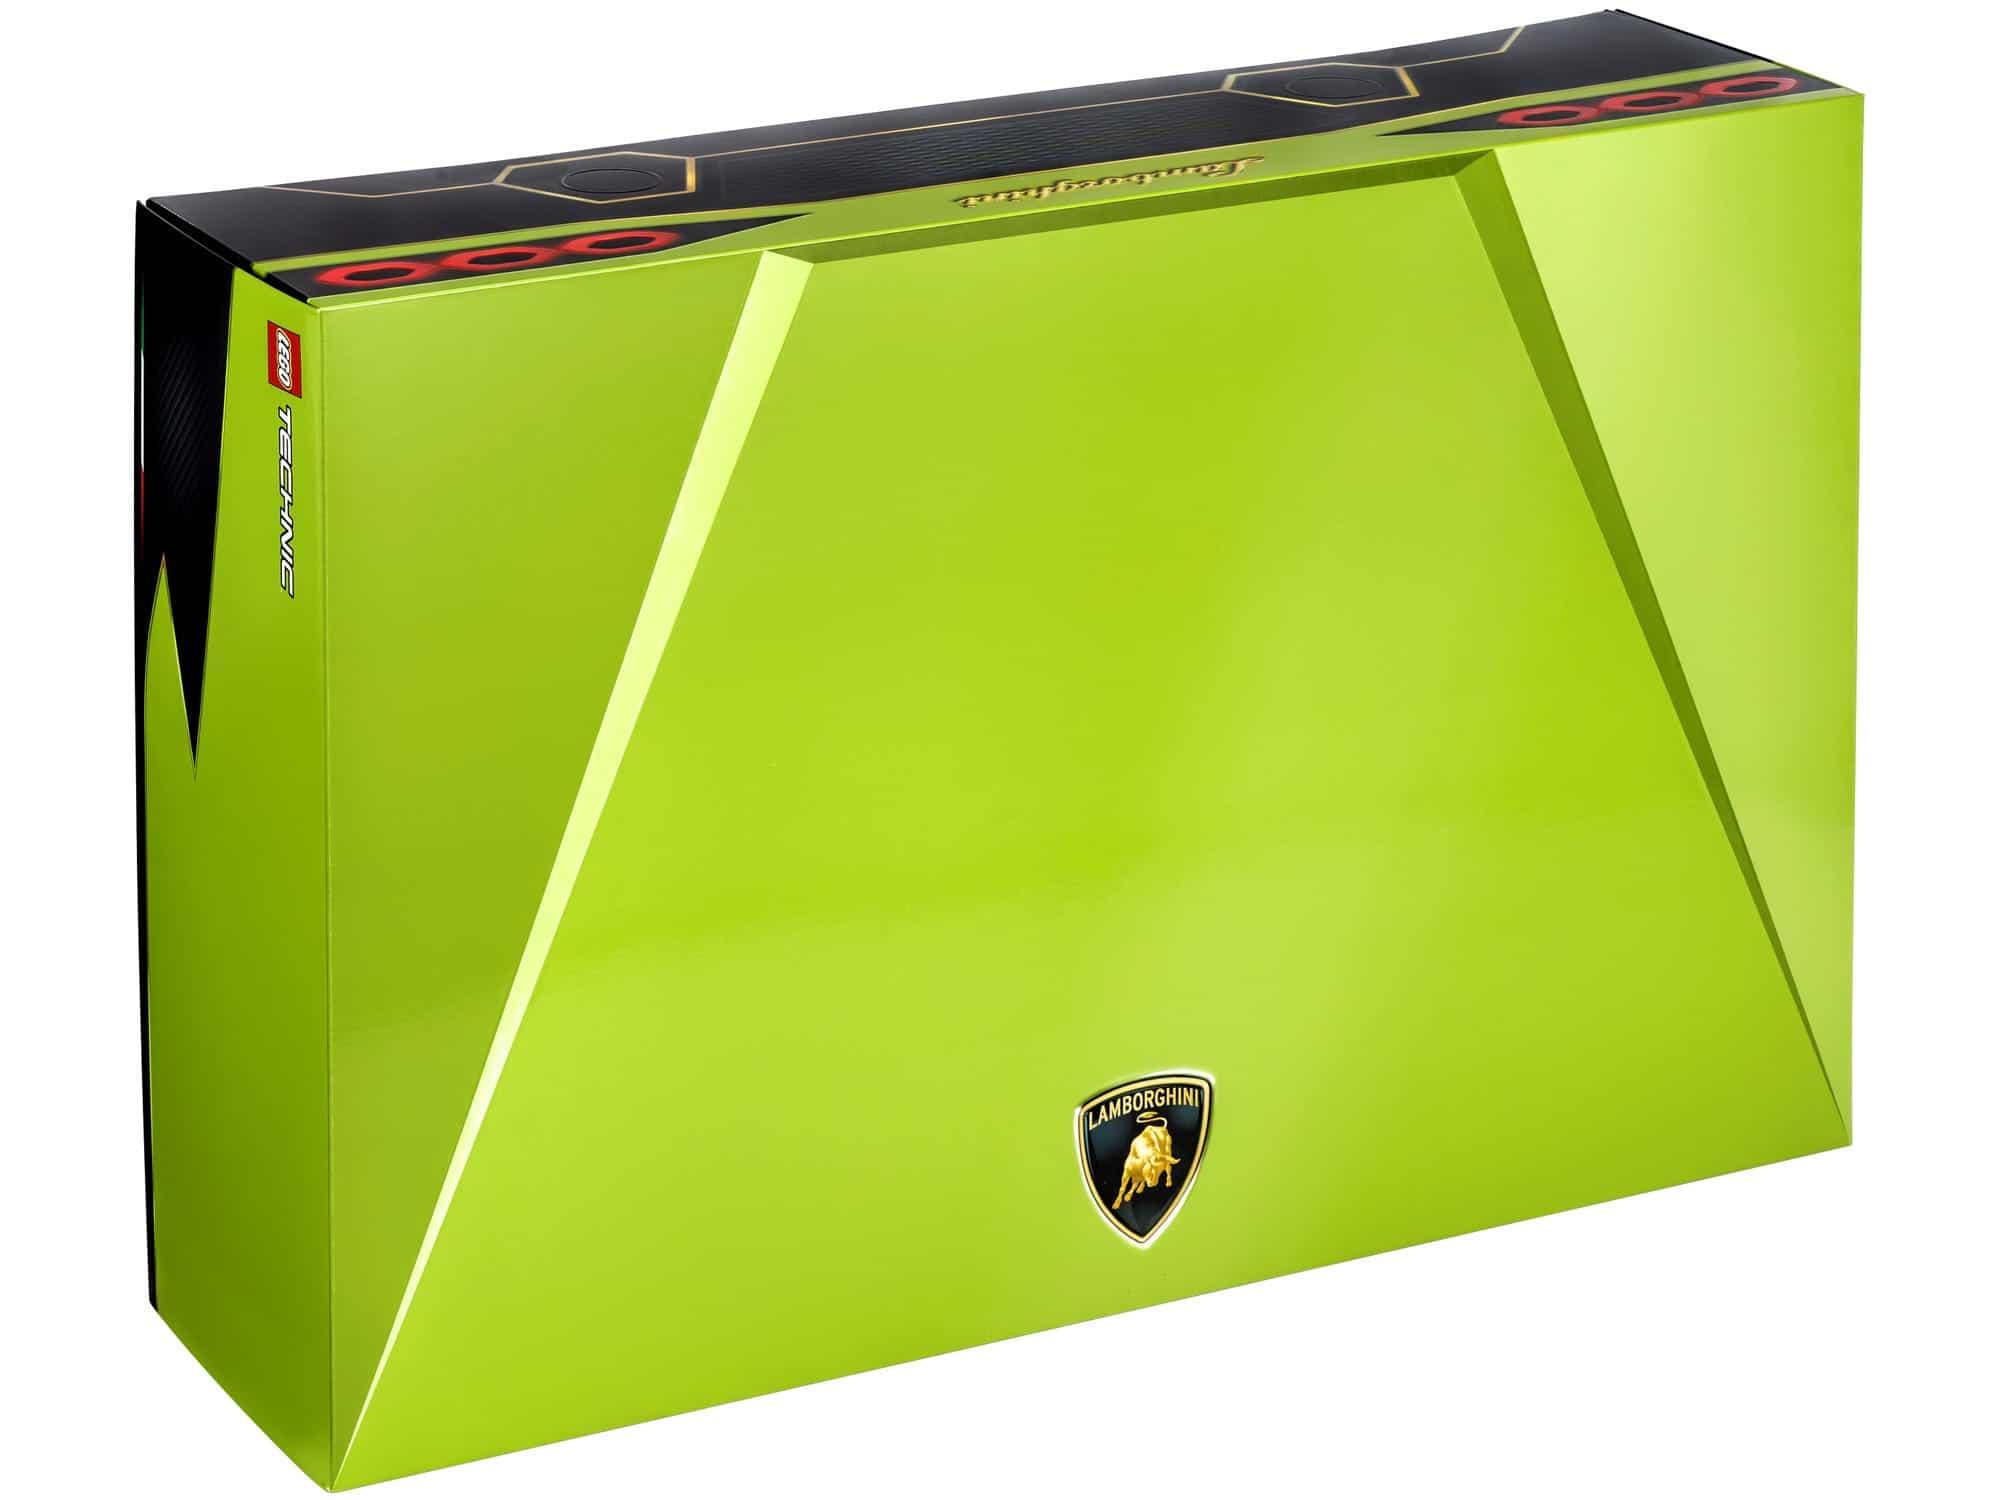 LEGO 42115 Technic Lamborghini Si N Fkp 37 2